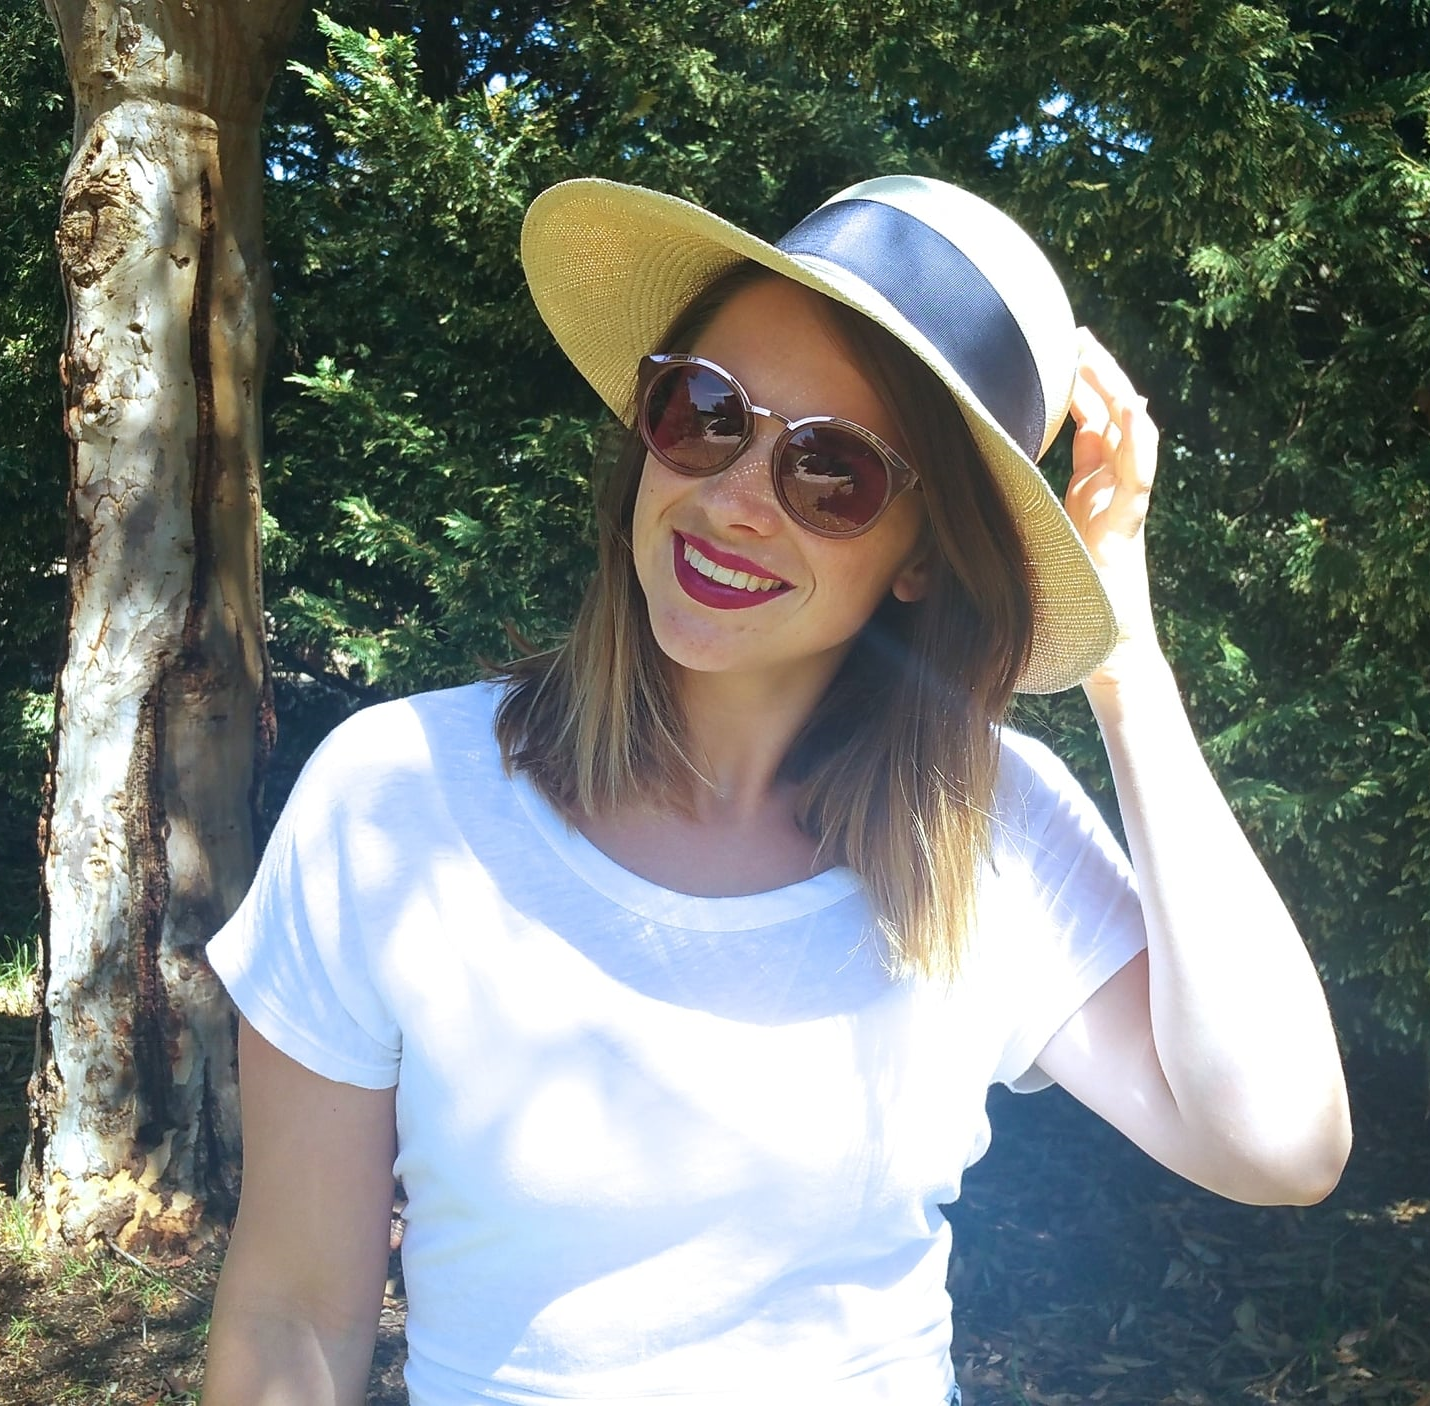 bonlook-sunglasses-summer-straw-hat-red-lips